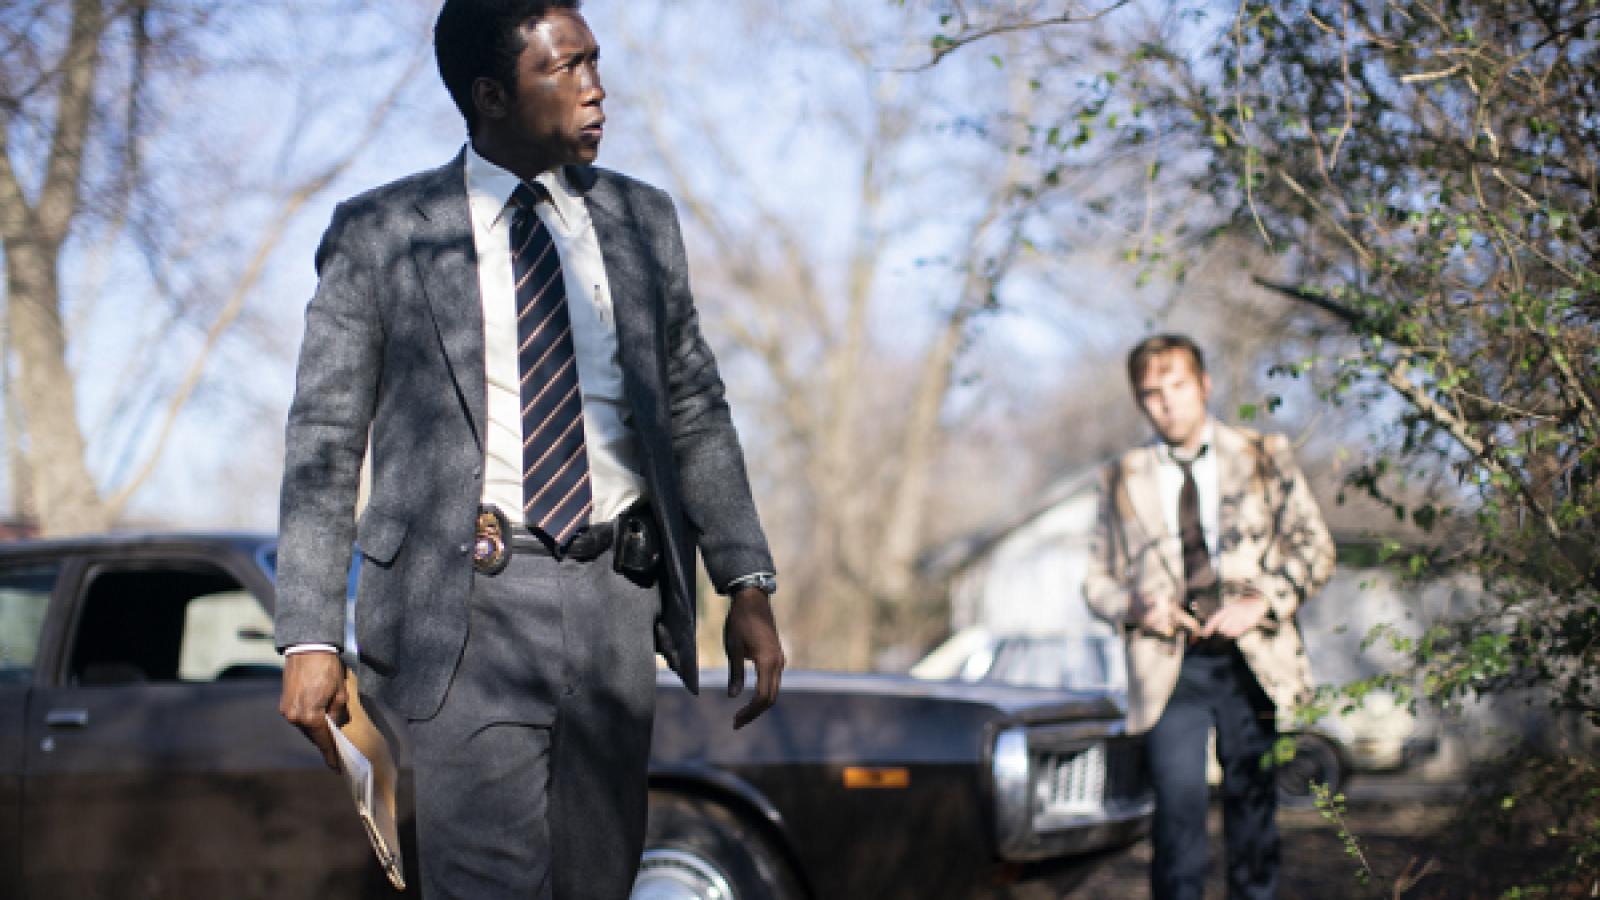 True Detective' Season 3 Reddit Theories: Could Season Three Be Tied